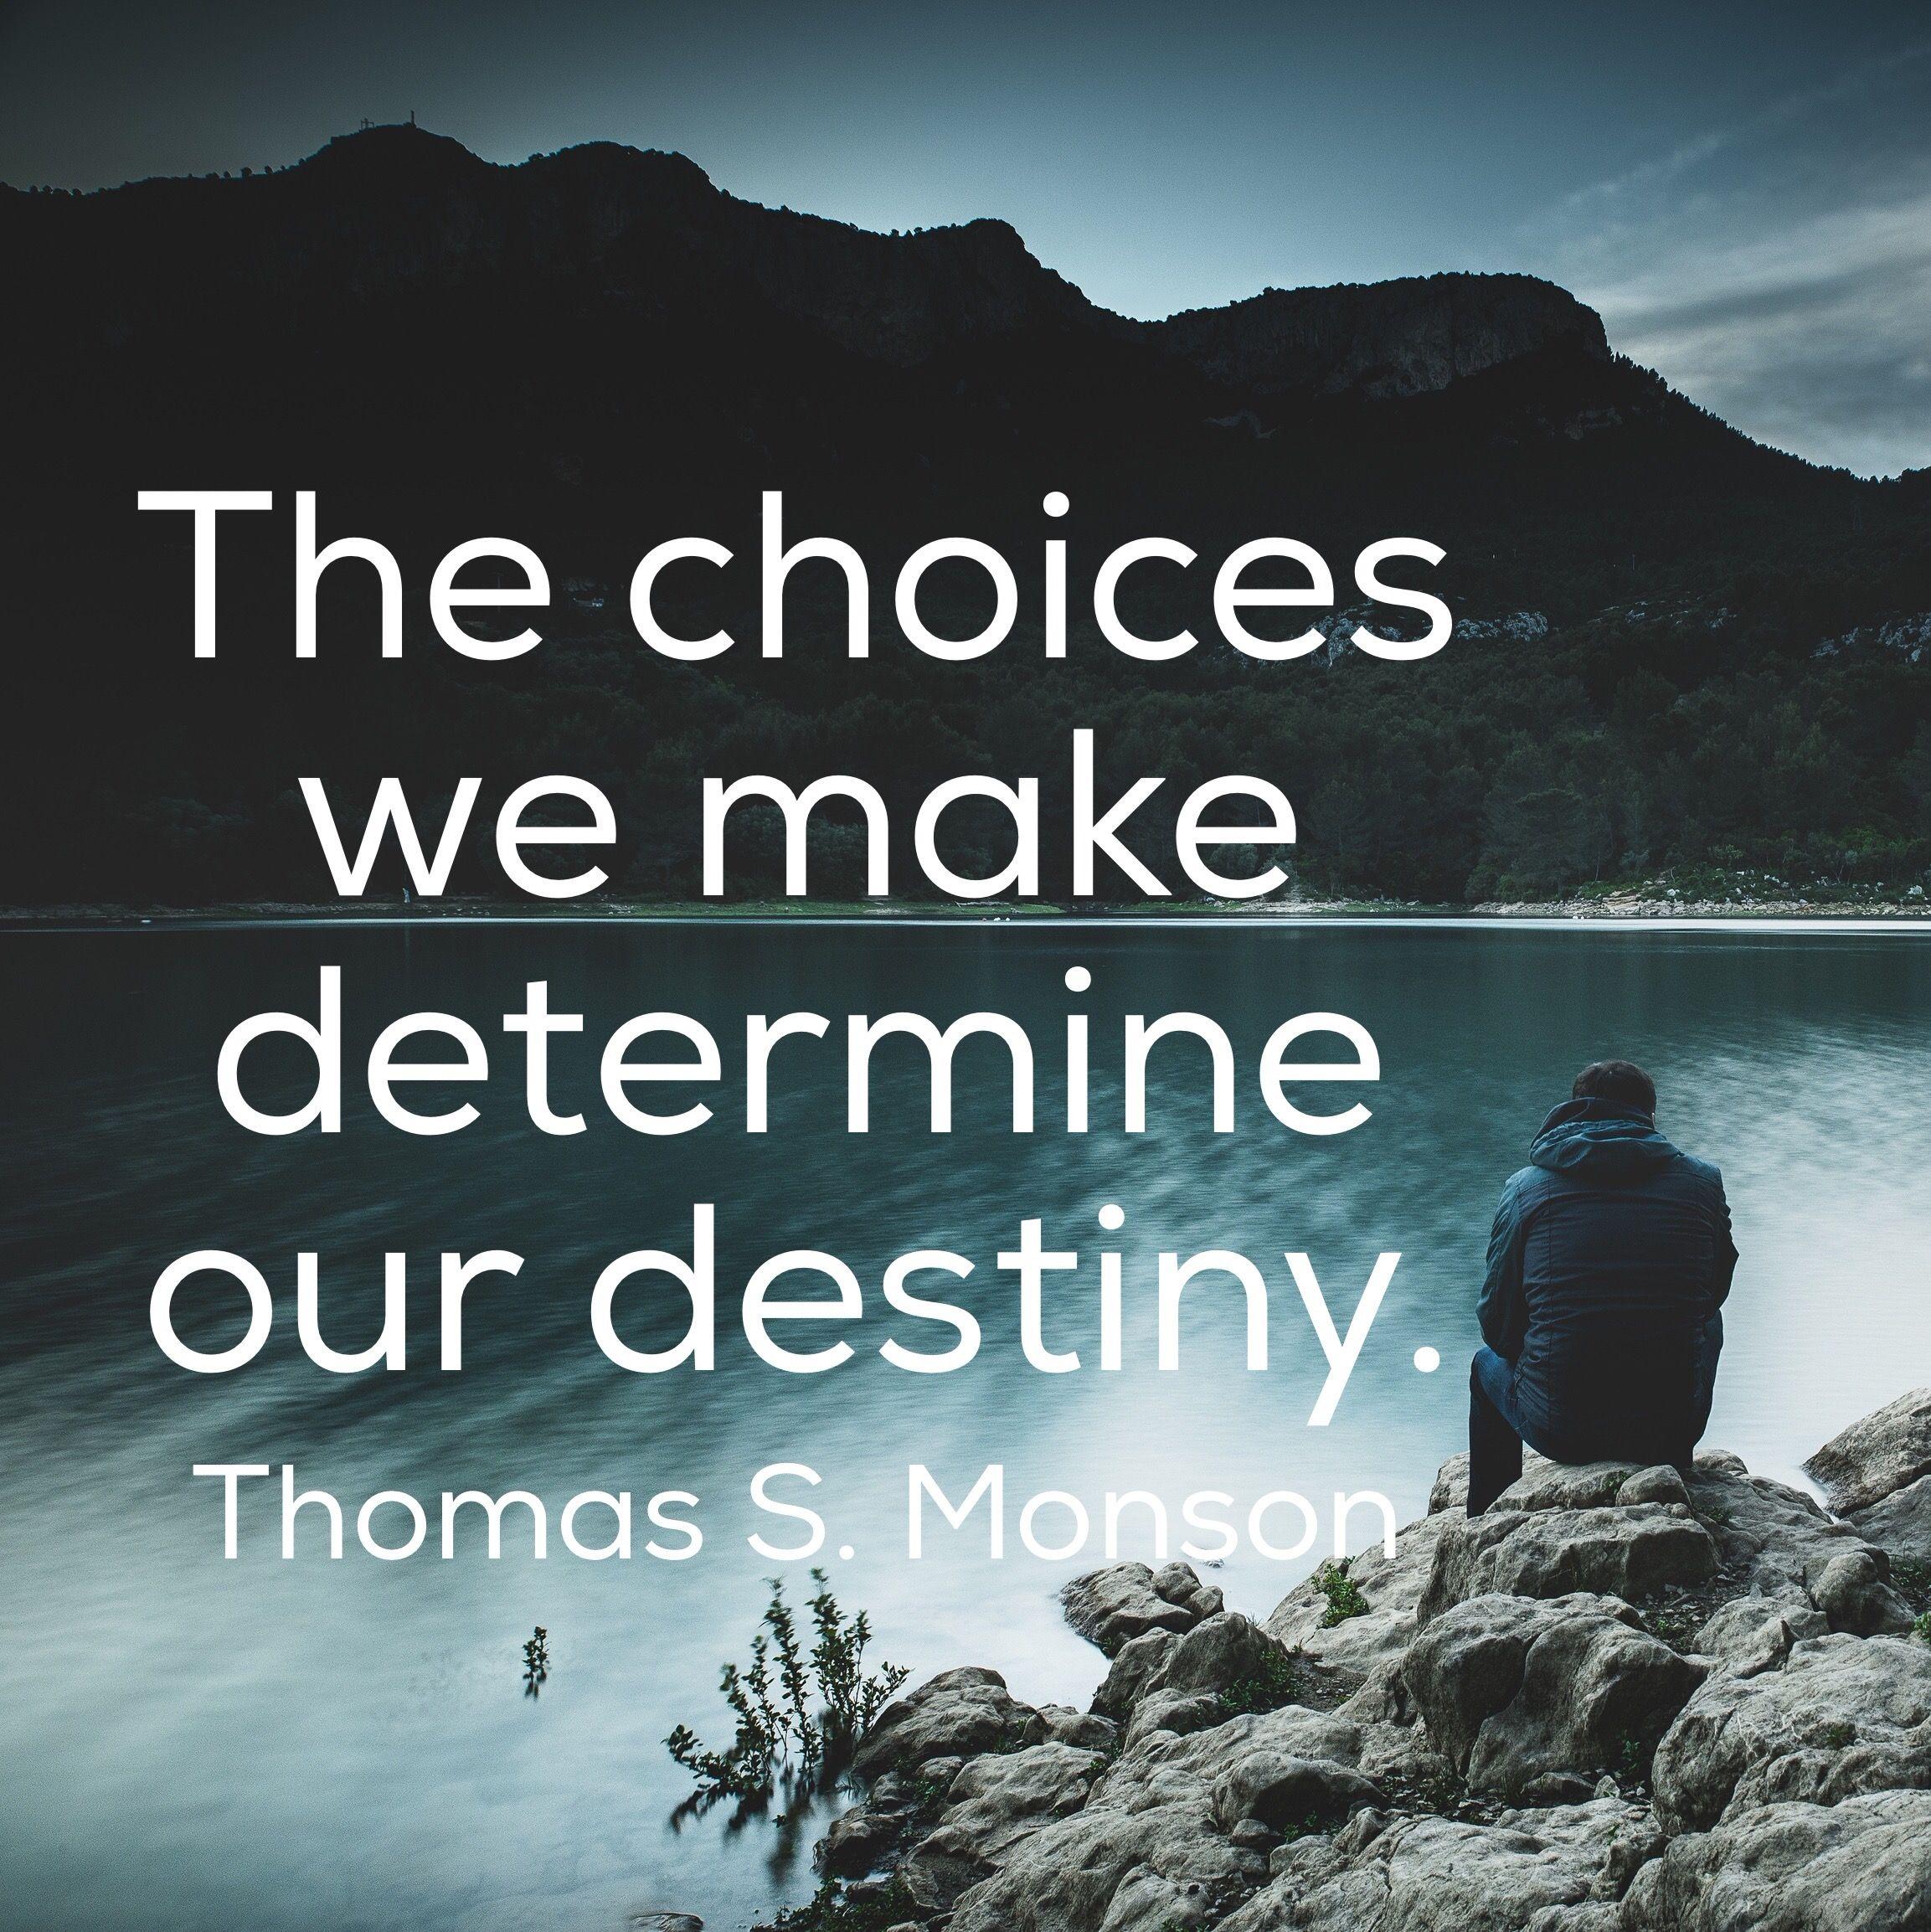 The Choices We Make Determine Our Destiny Thomas S Monson